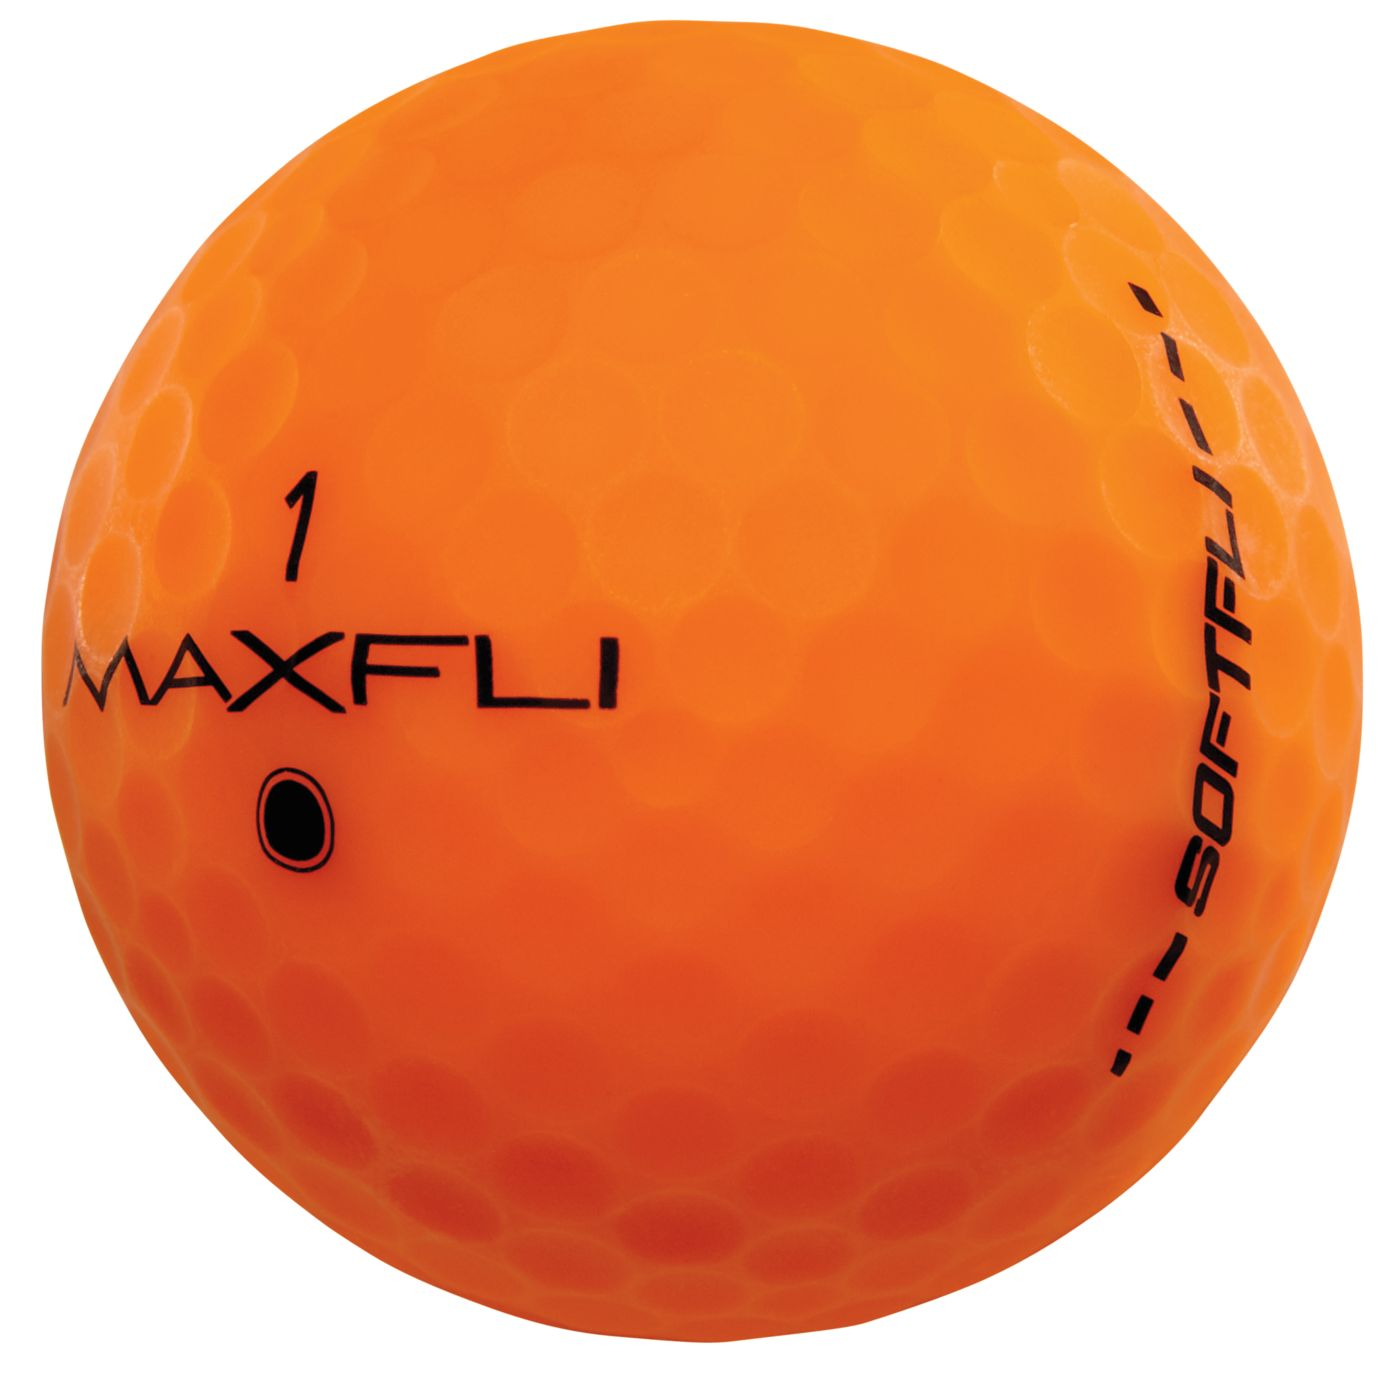 Maxfli SoftFli Matte Personalized Golf Balls – Orange